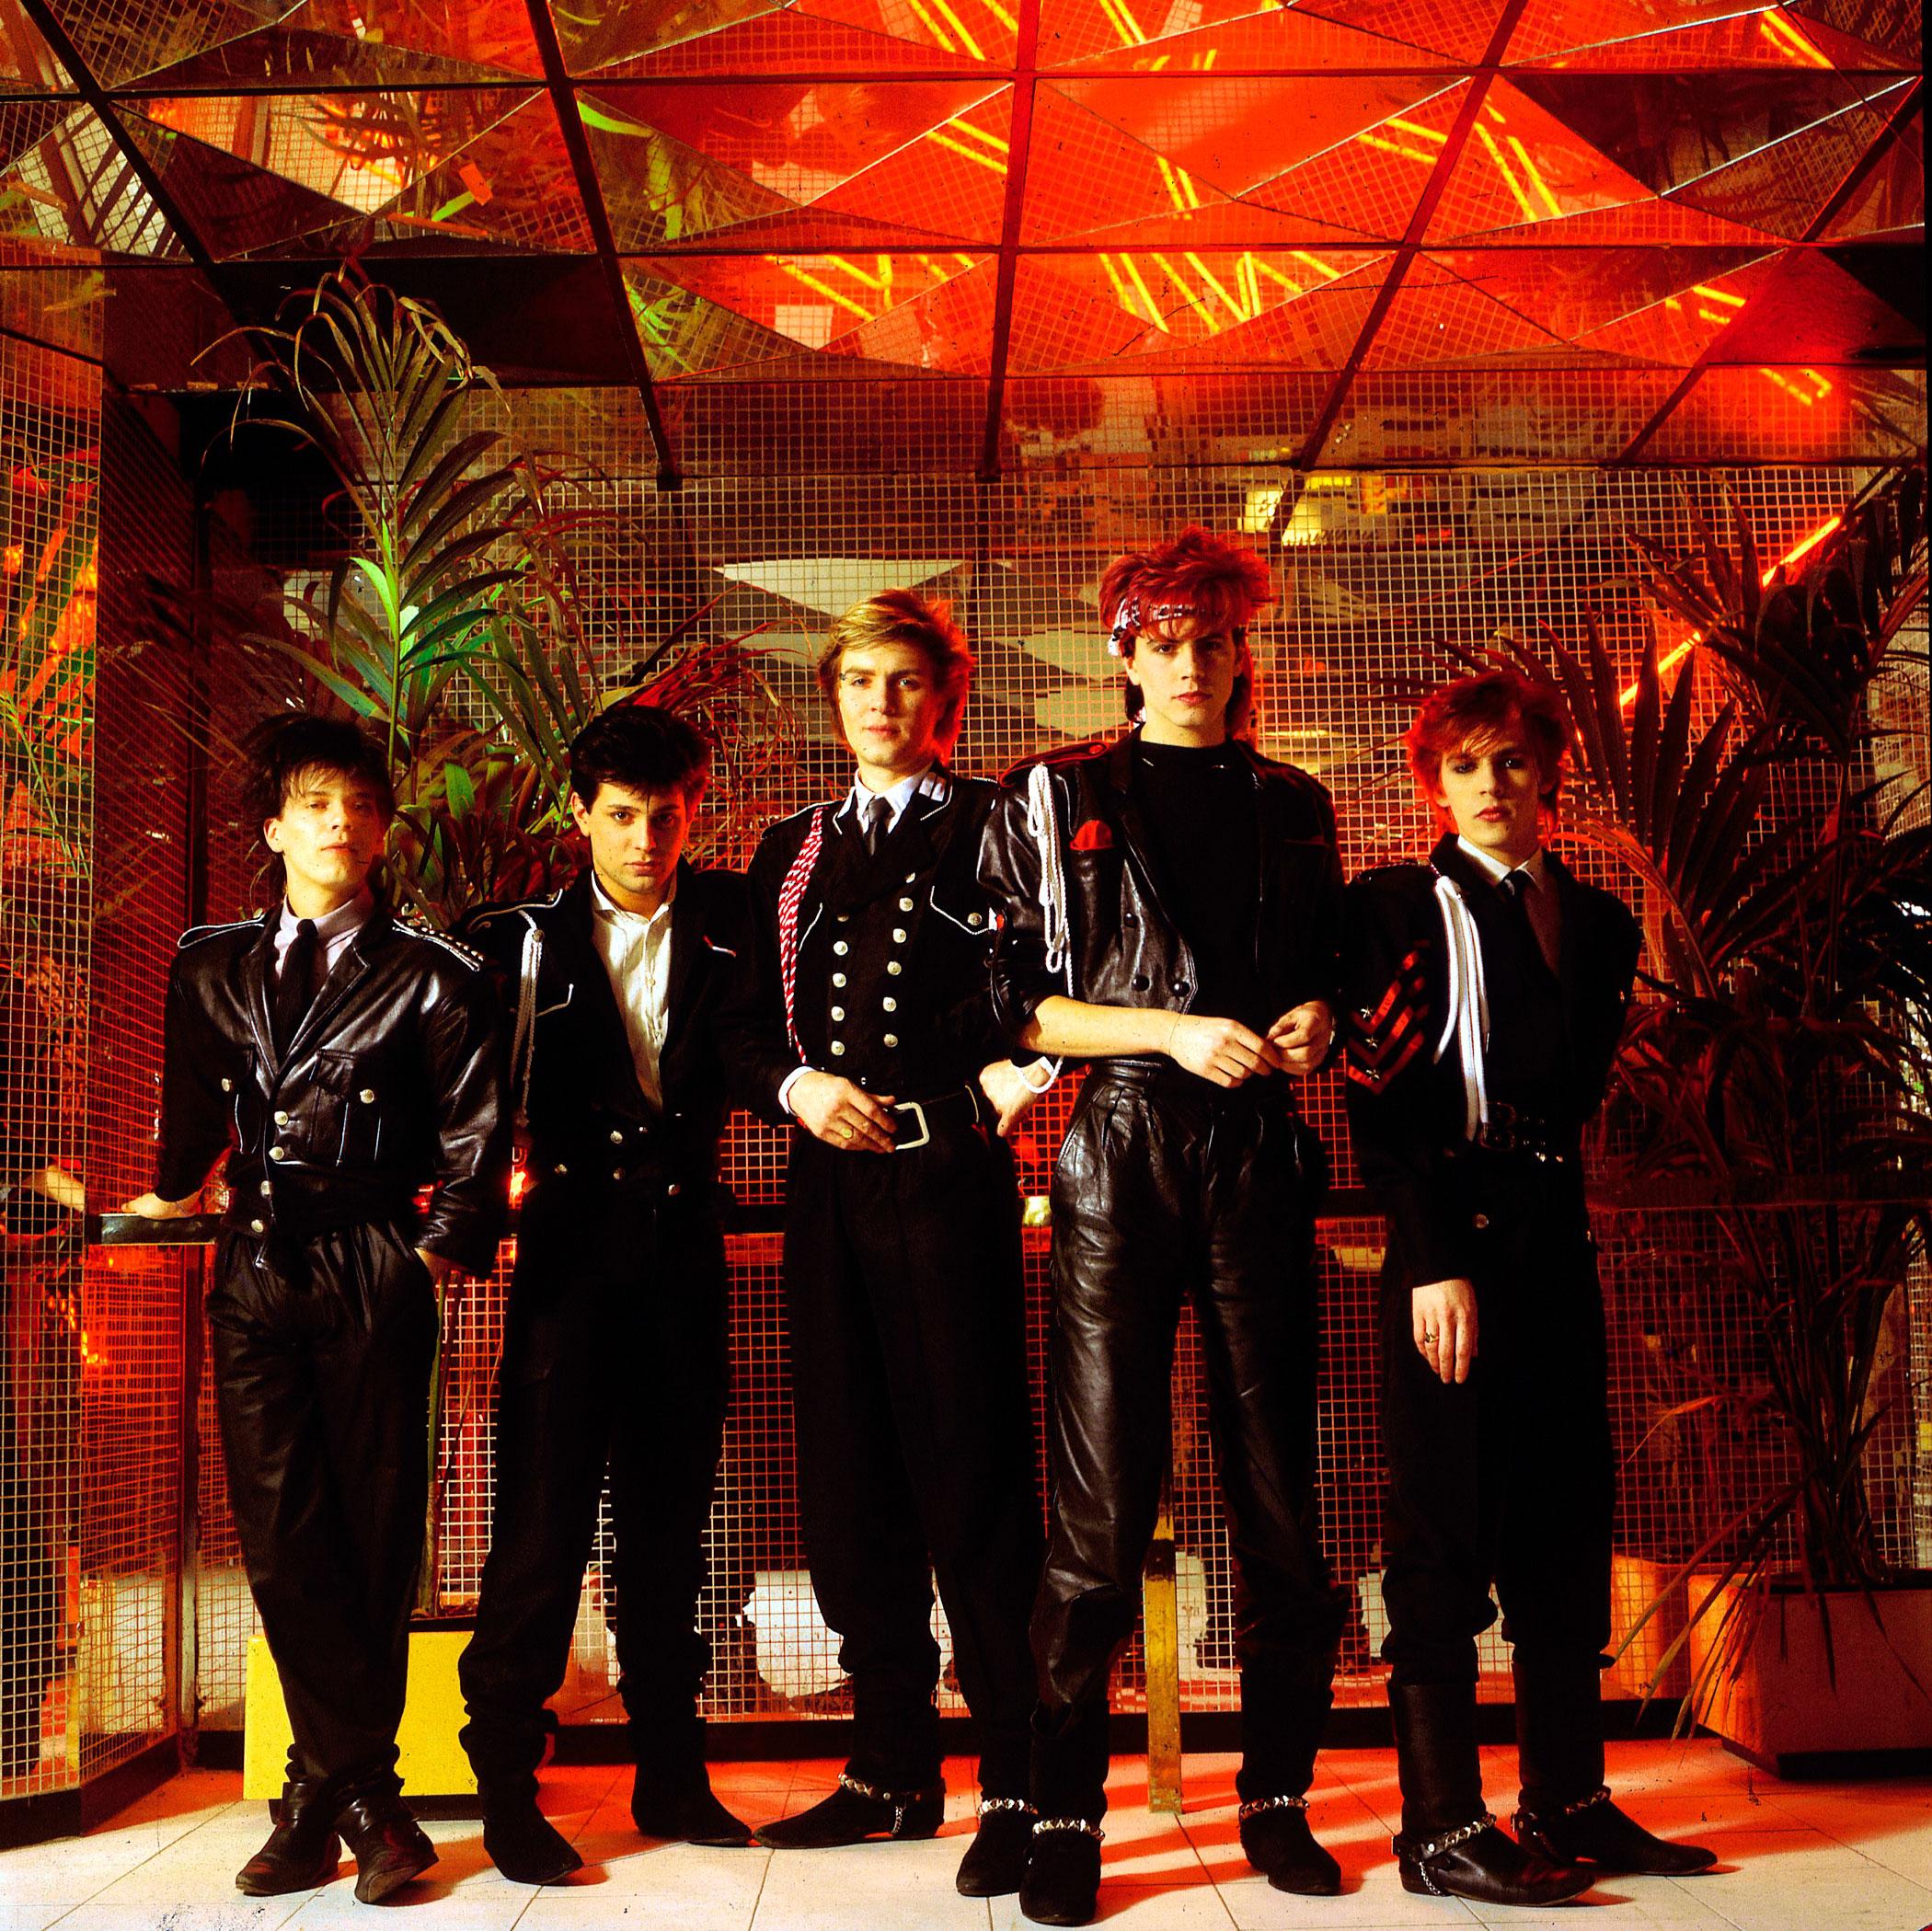 <b>Duran Duran</b> sang the theme song for <i>A View to Kill</i>.